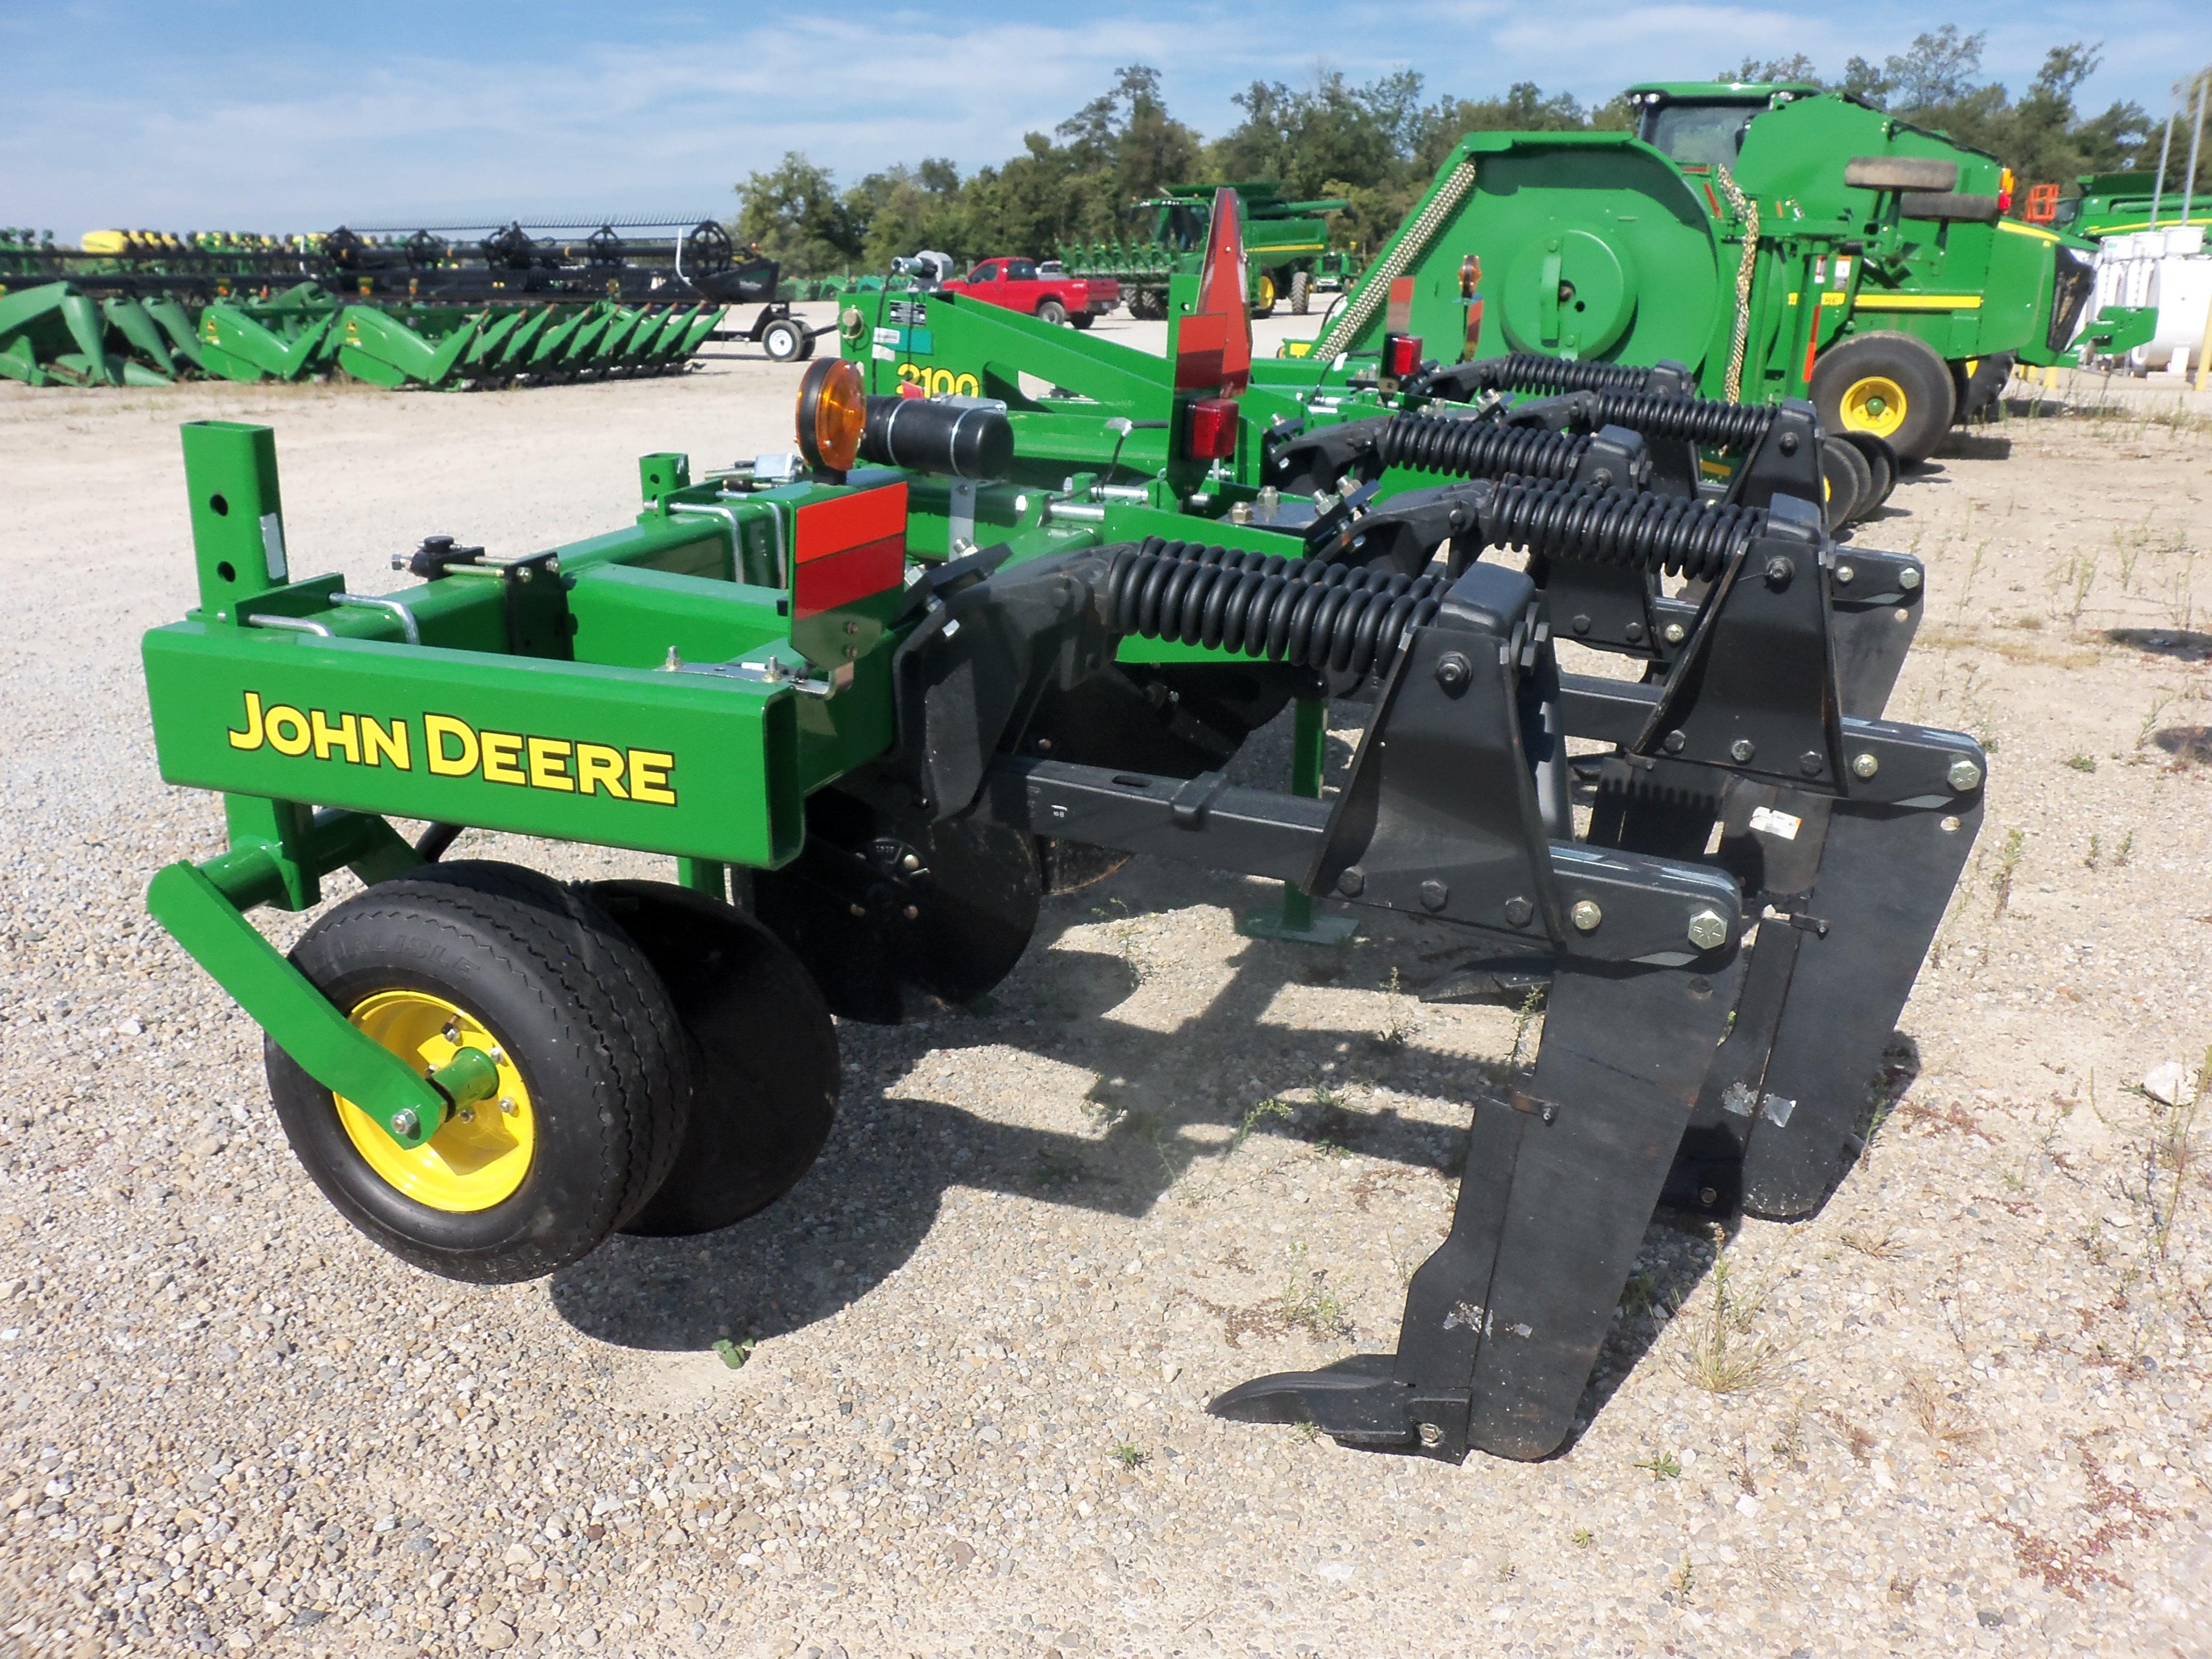 John Deere 2100 inline ripper | John Deere equipment ...